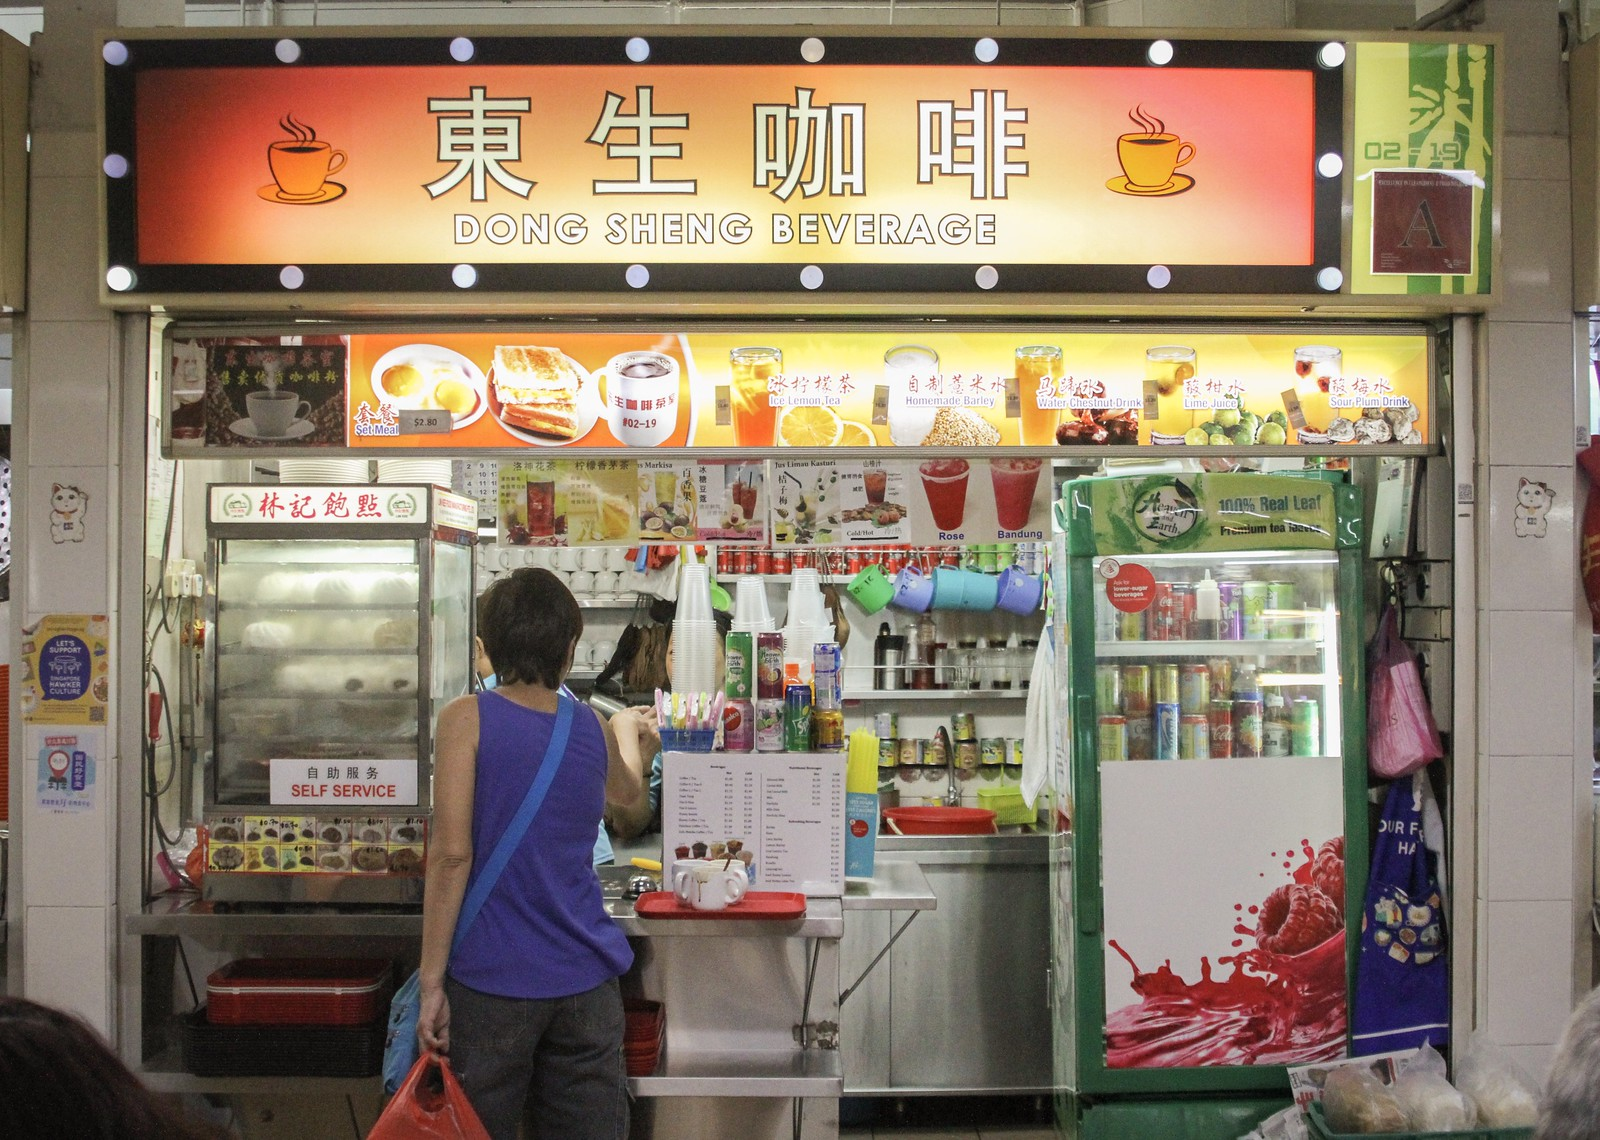 Hong Lim Market and Food Centre Dong Sheng Beverage Stall Front